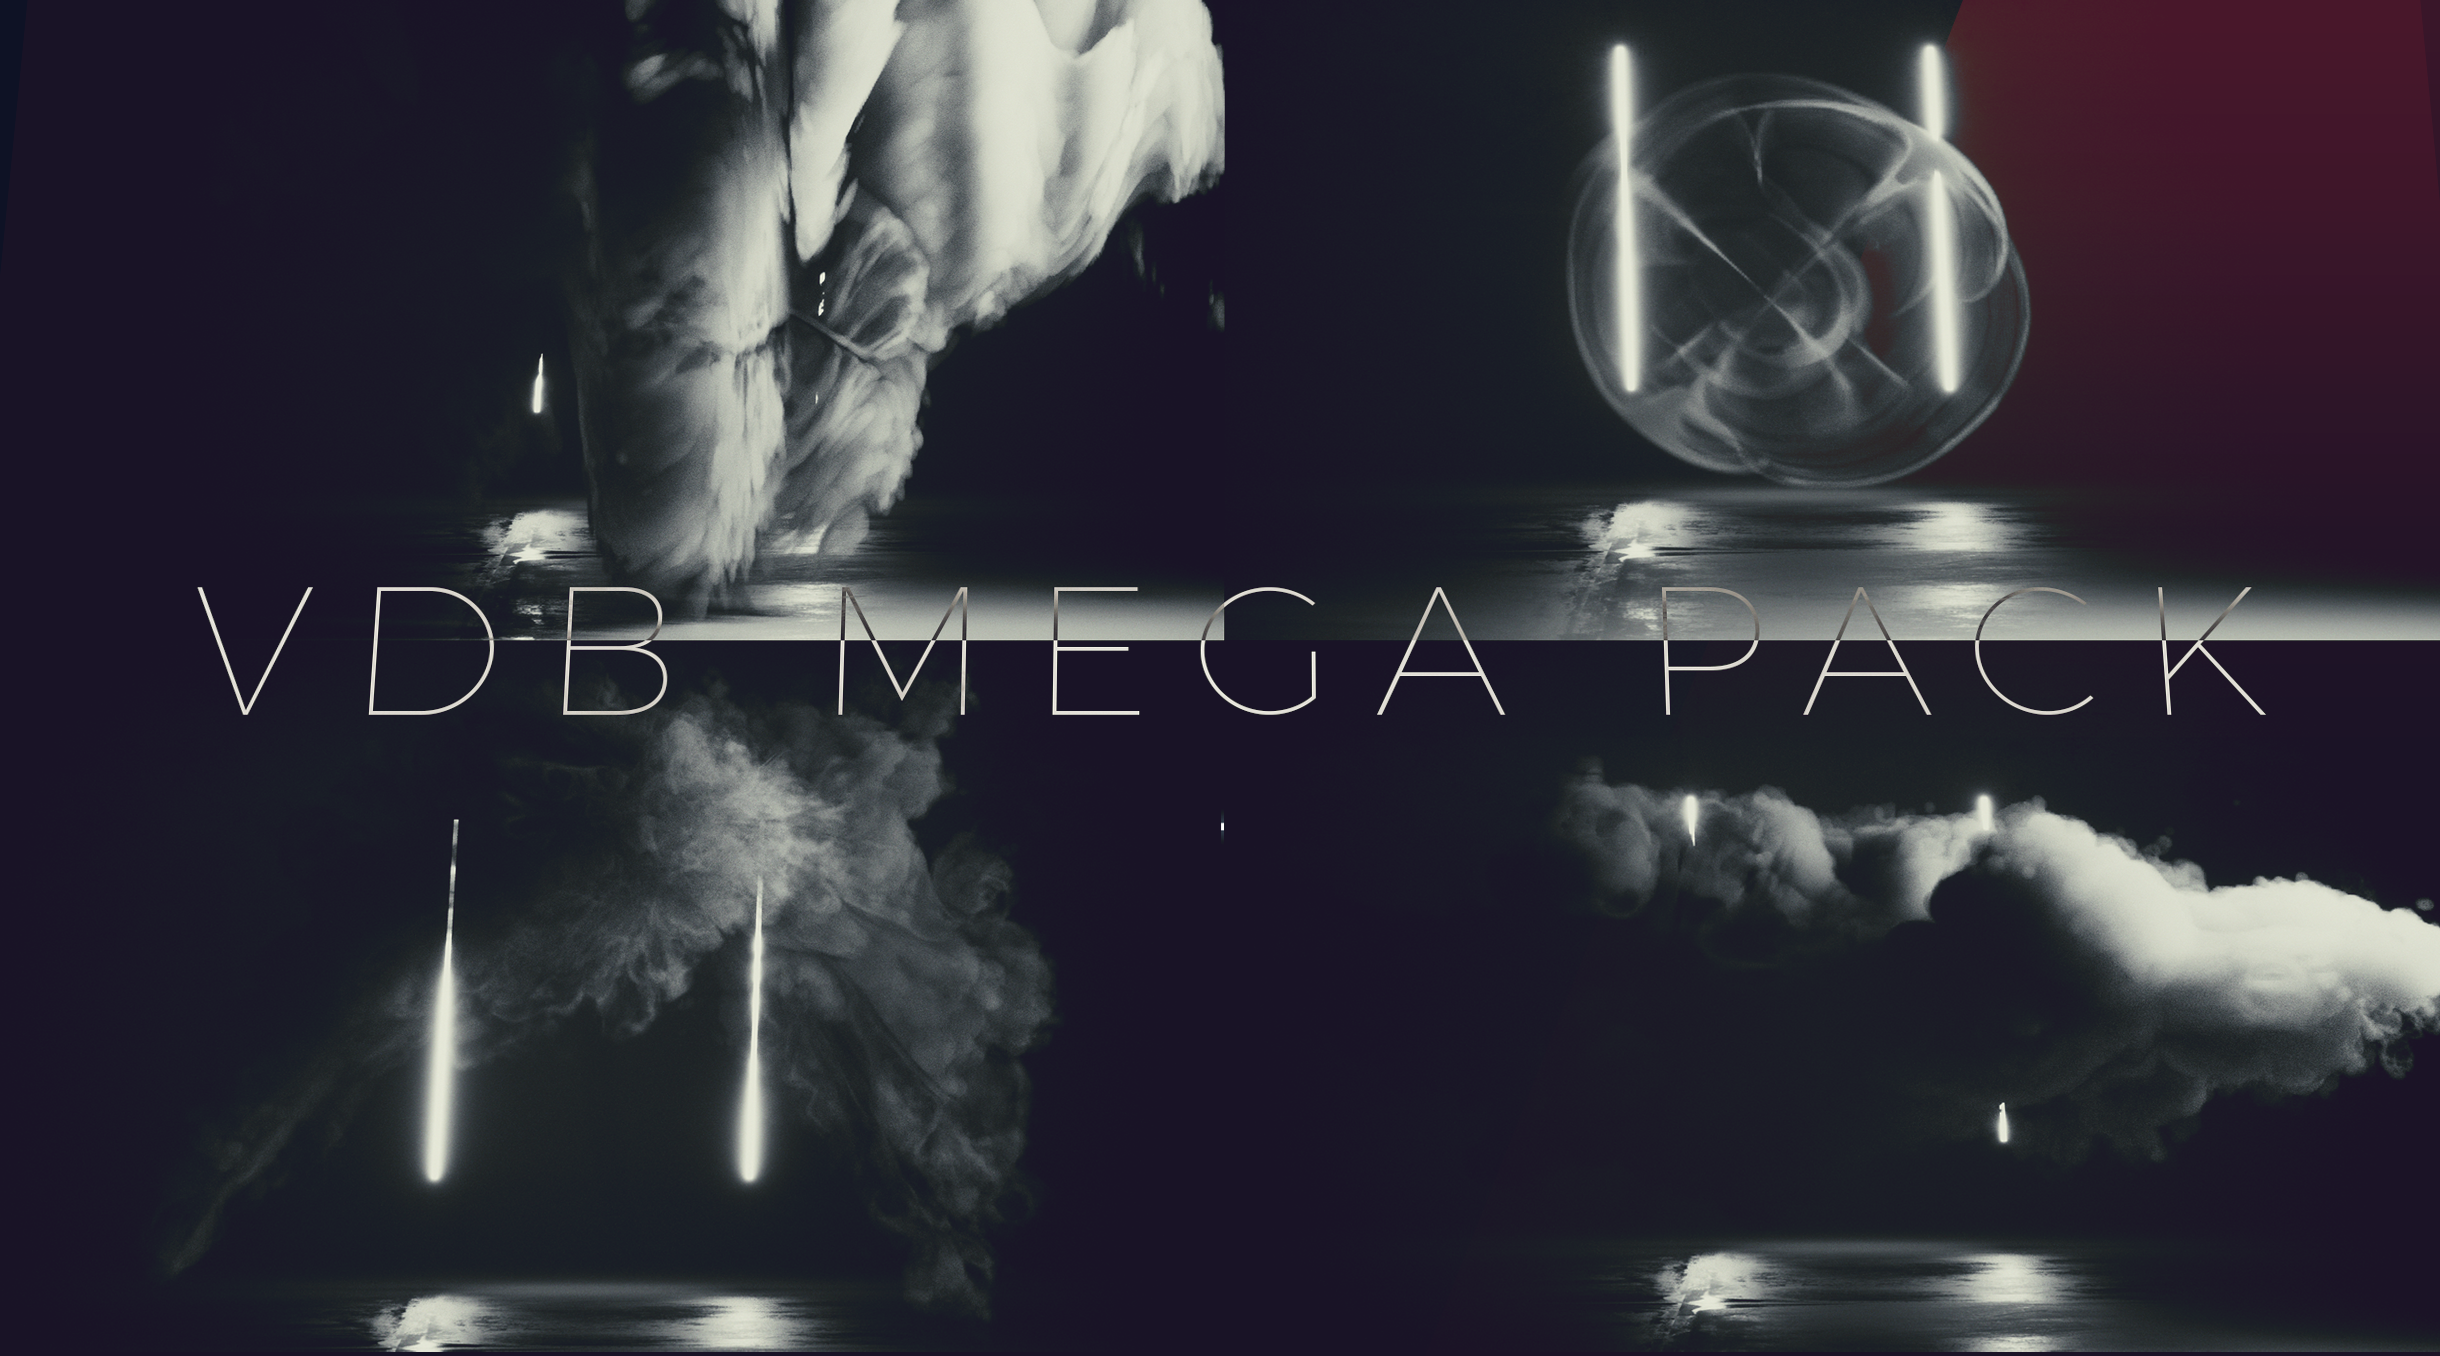 VDB_MegaPack_CoverC.png